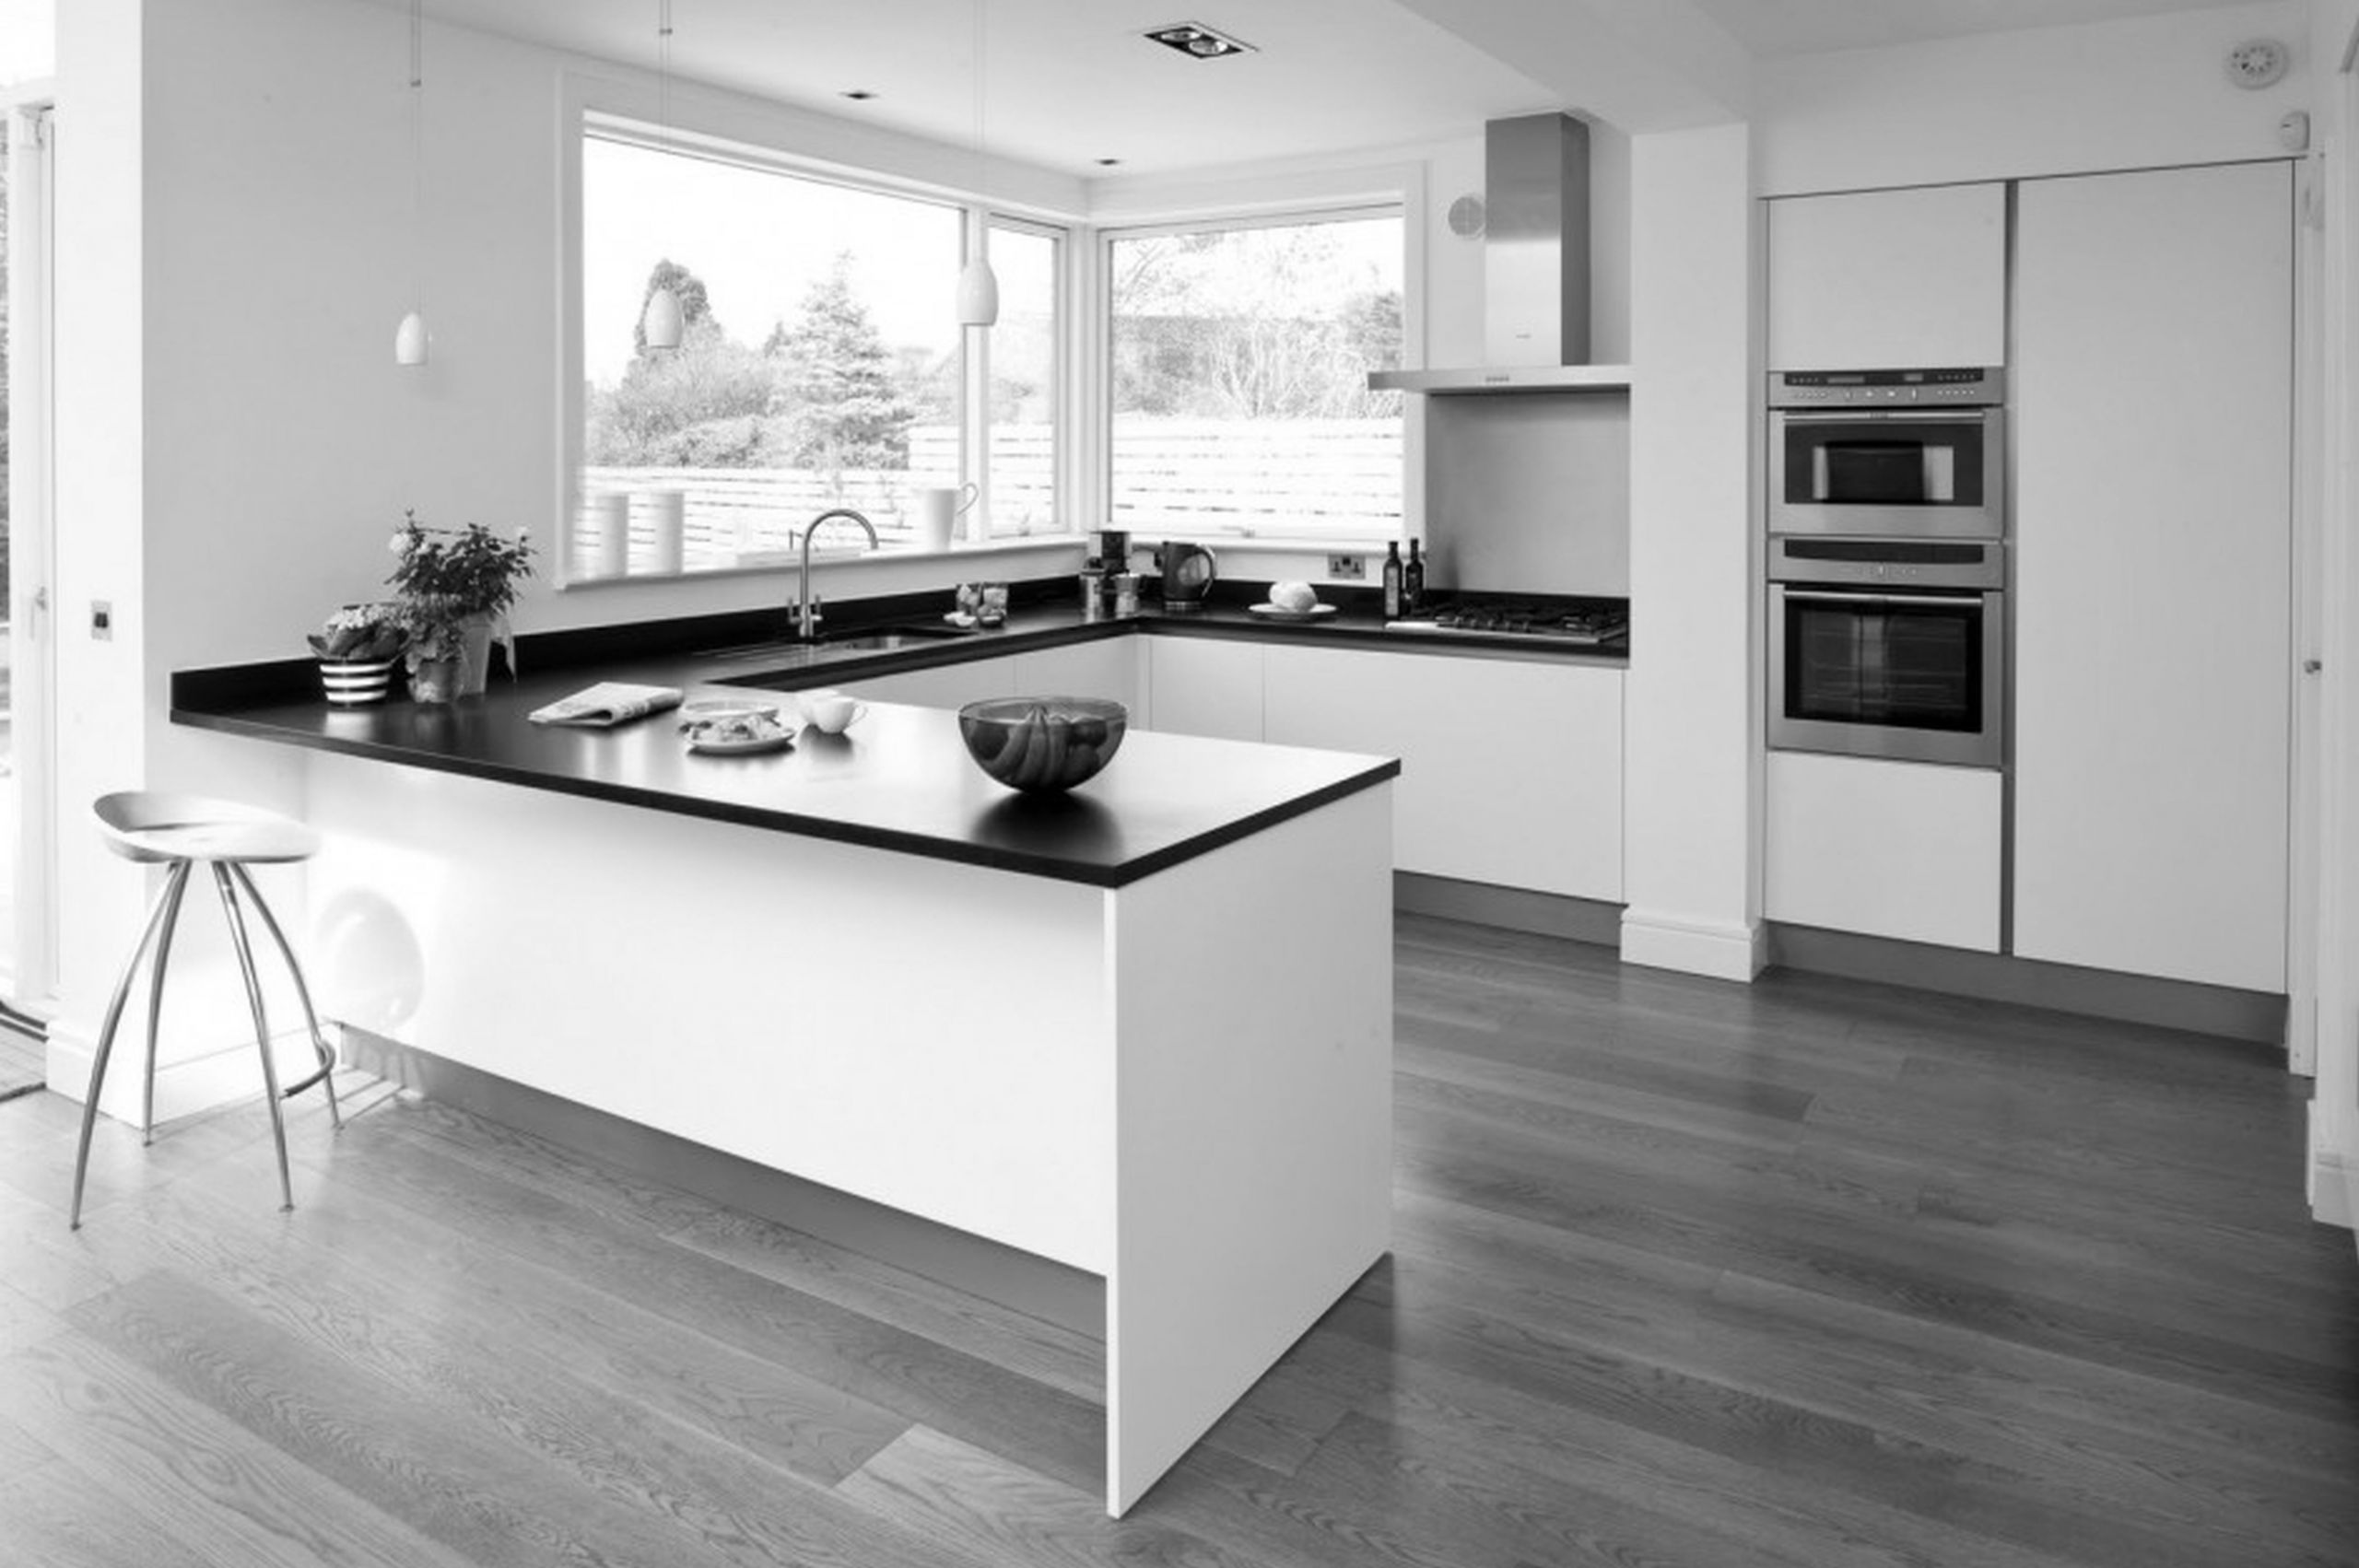 Kitchen Floor Plans With Islands  4 Insightful Kitchen Floor Ideas MidCityEast